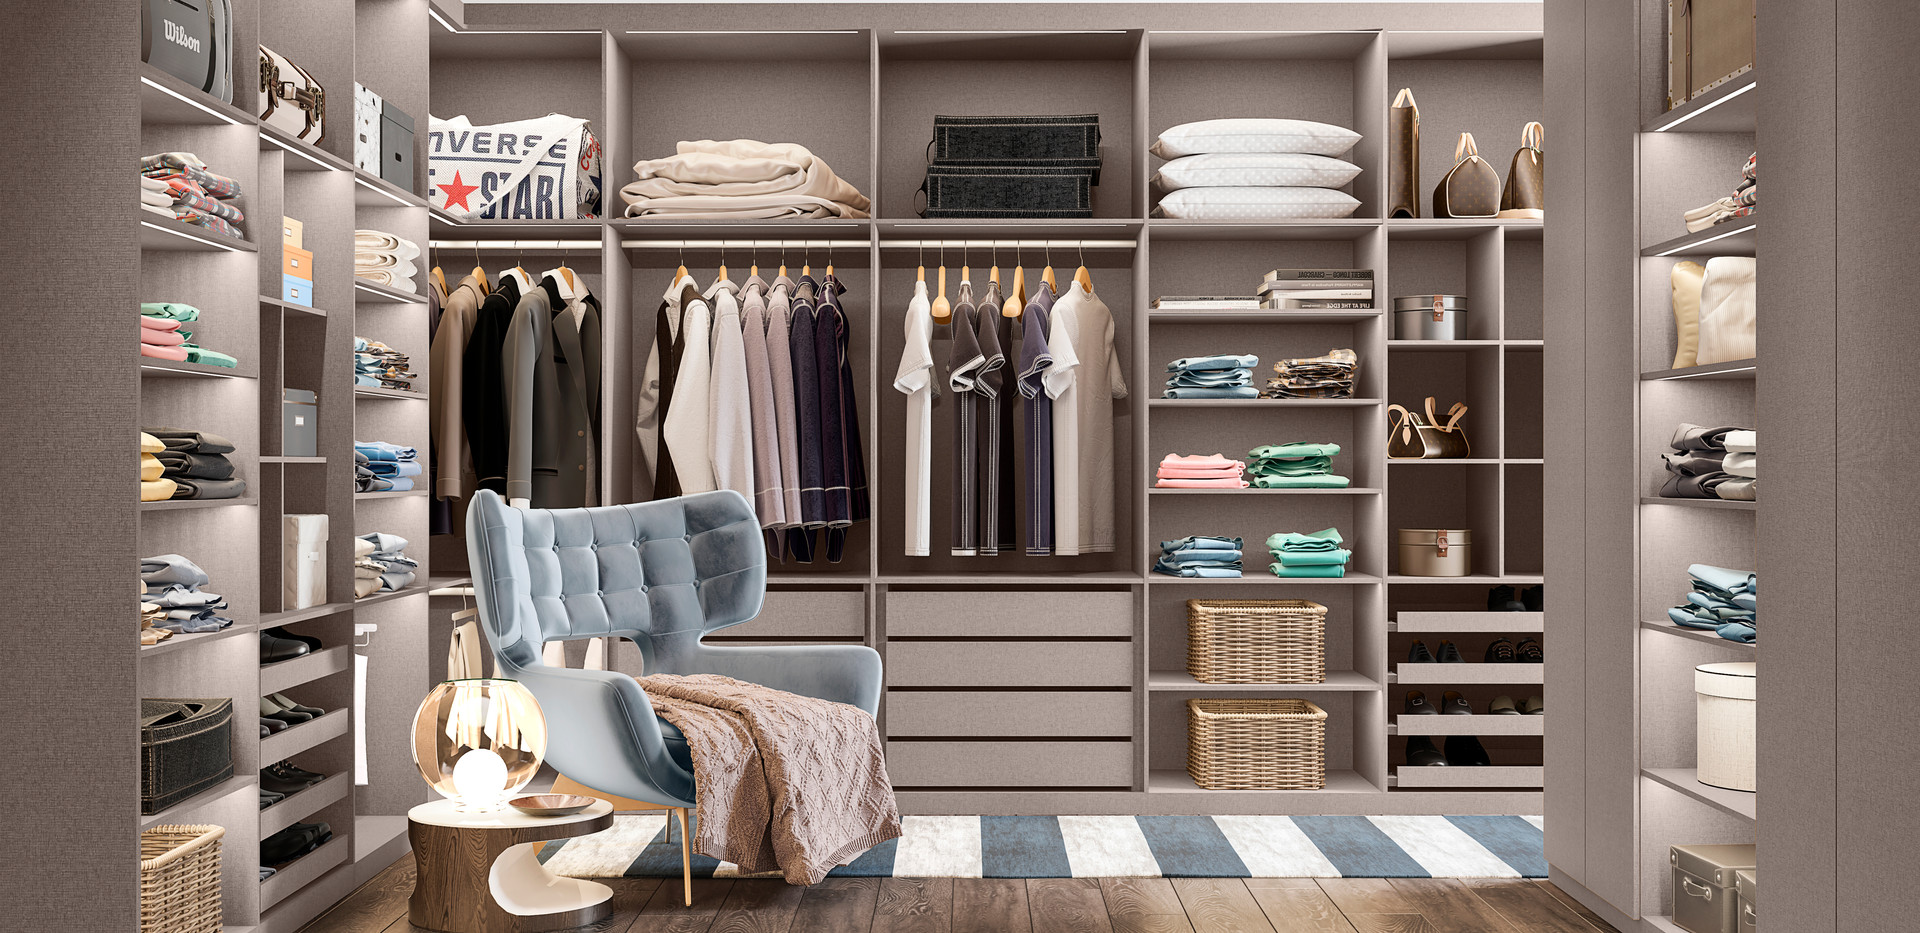 Closet 01 - Moka Eco